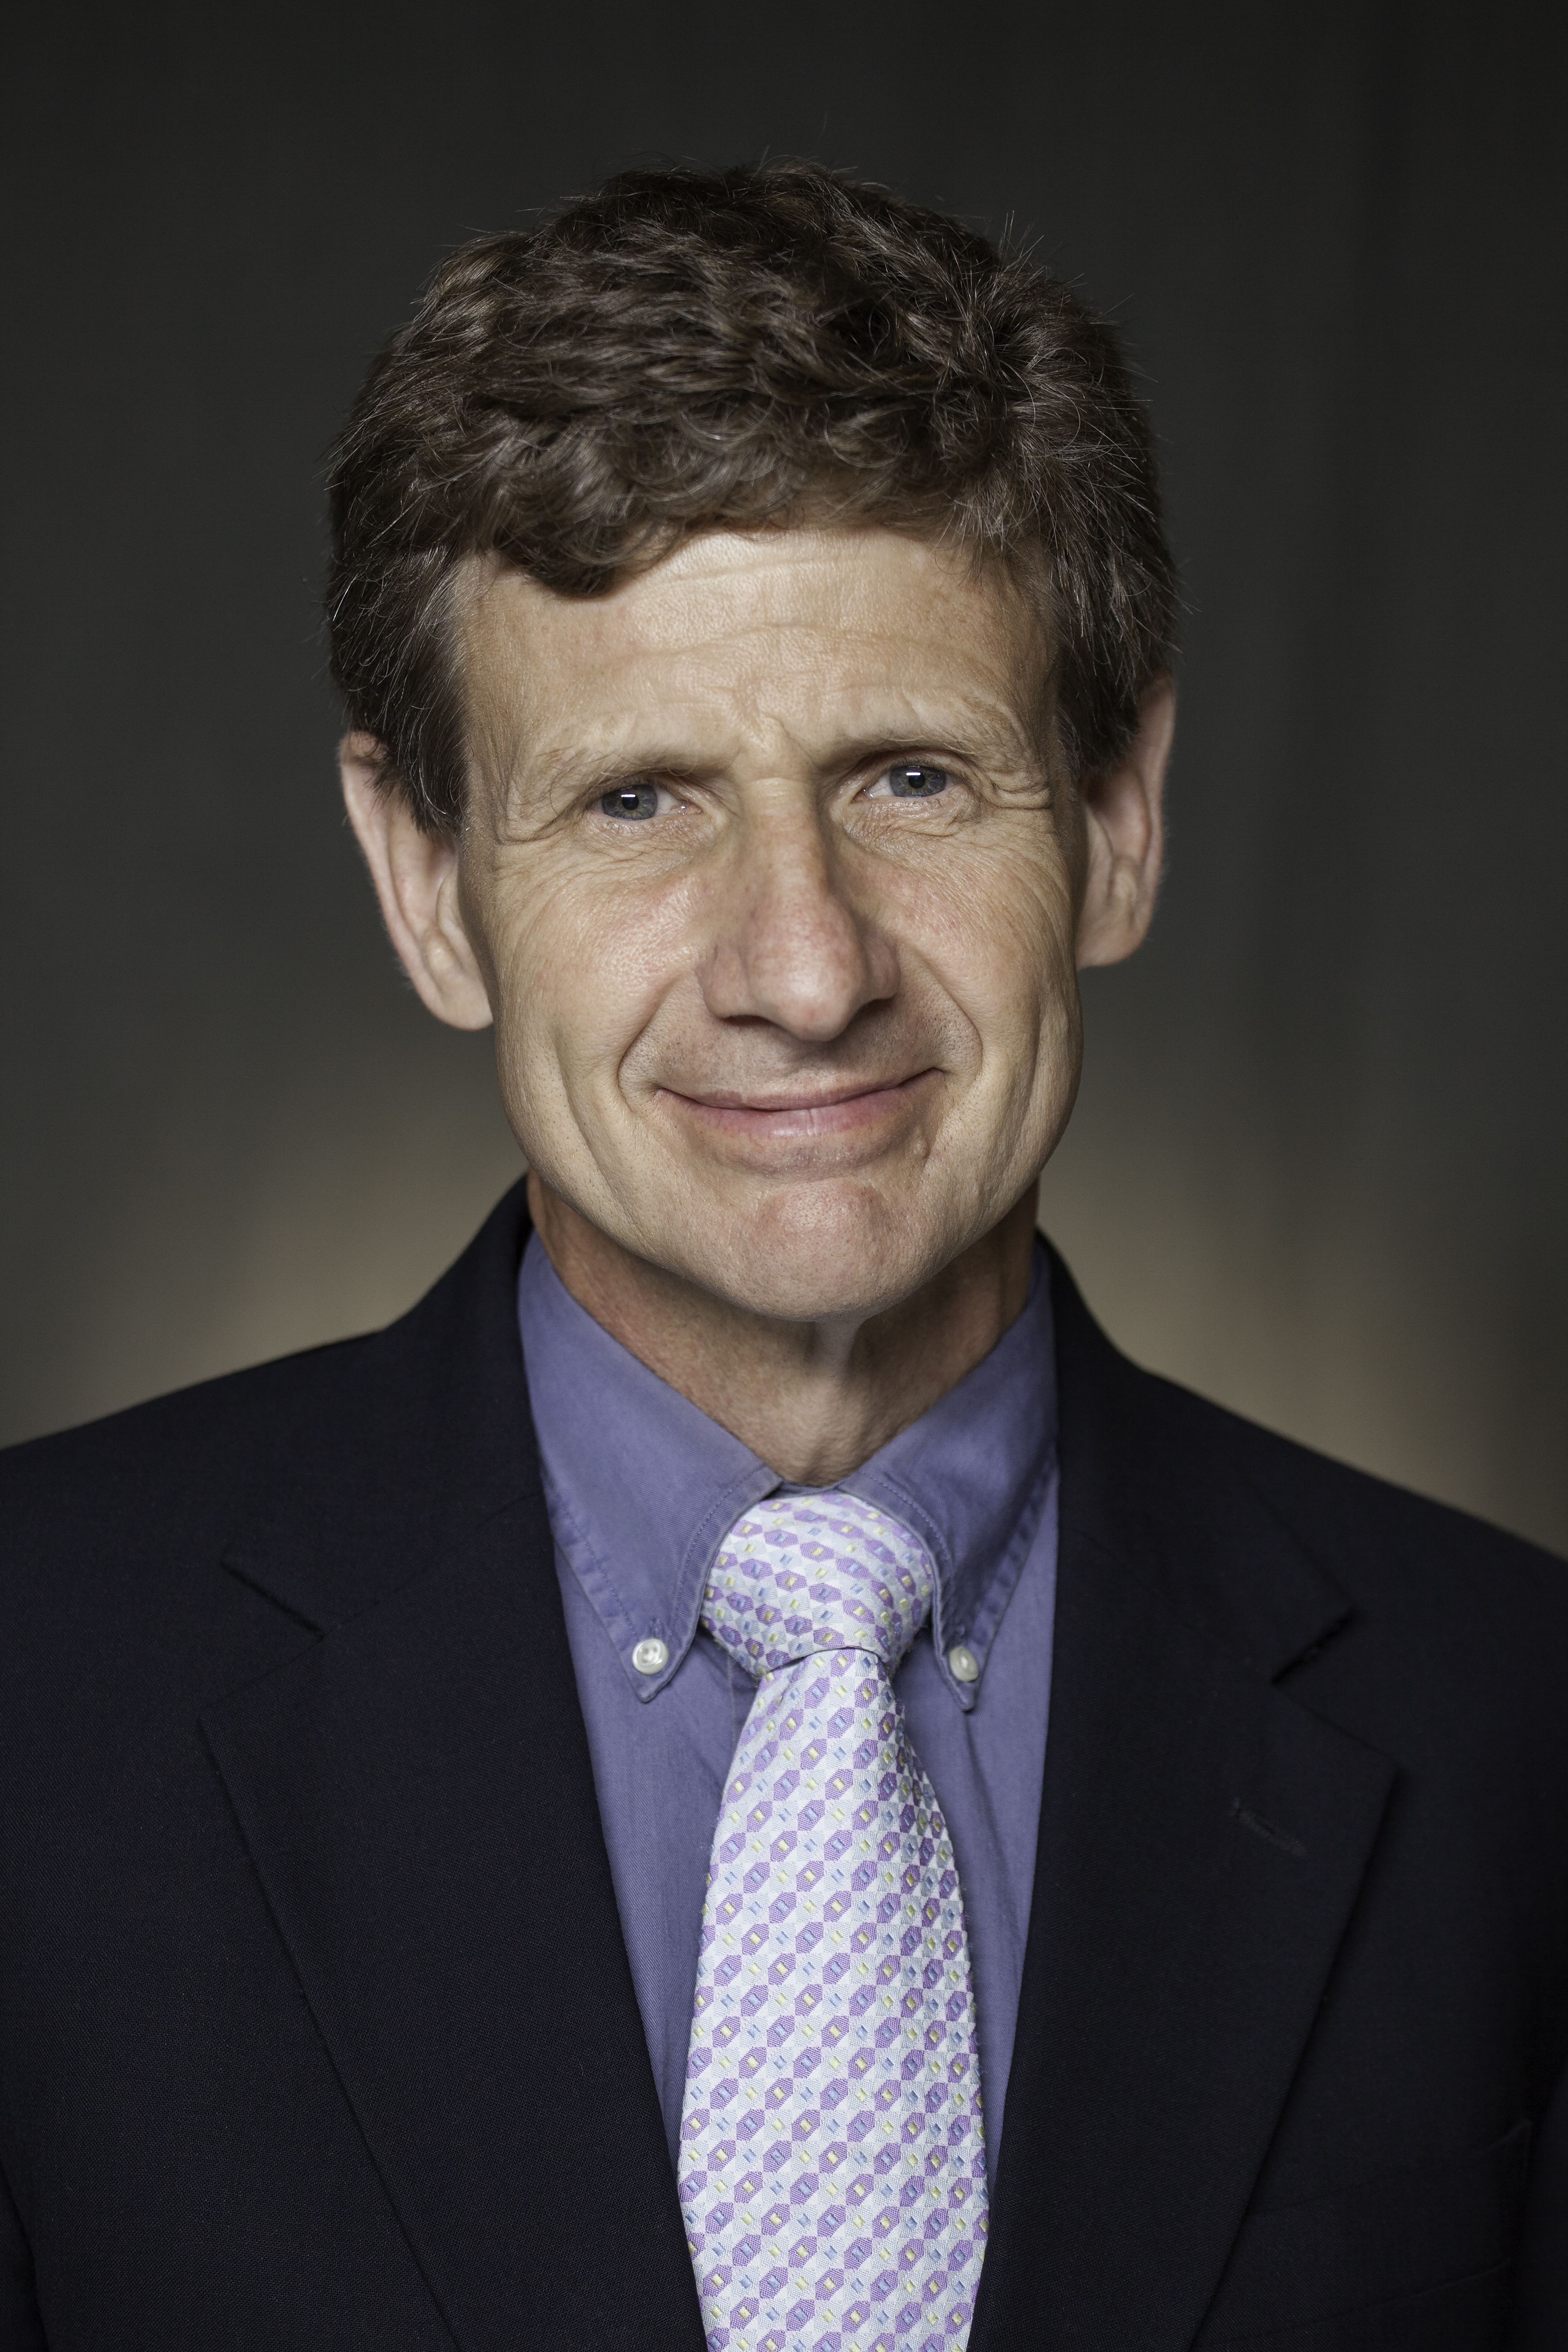 R. Kirk Belnap